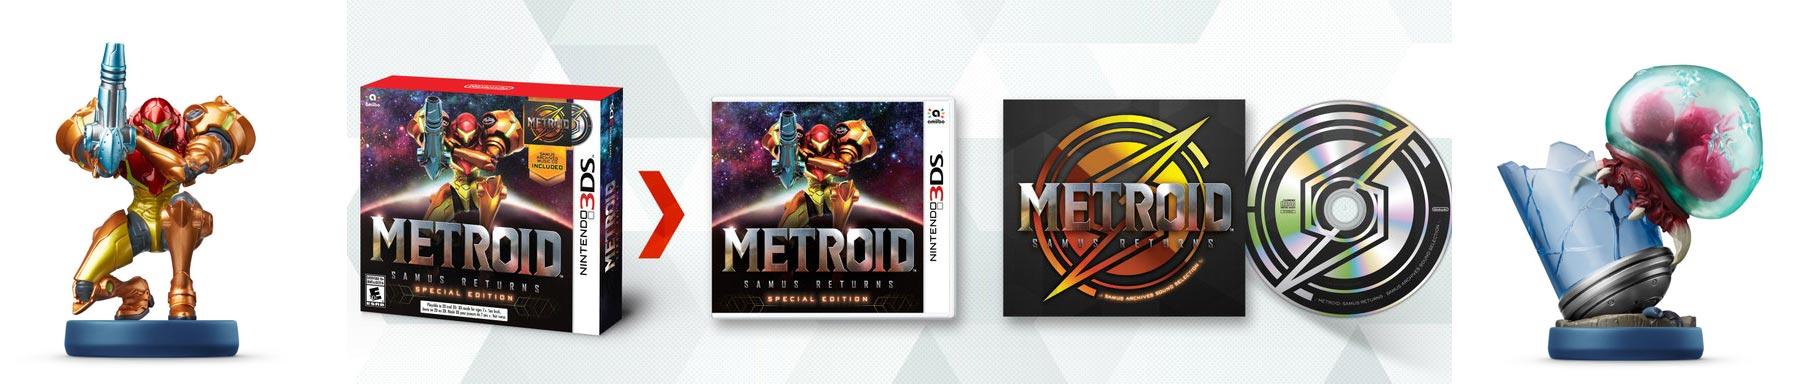 Metroid: Samus Returns Limited Edition amiibo